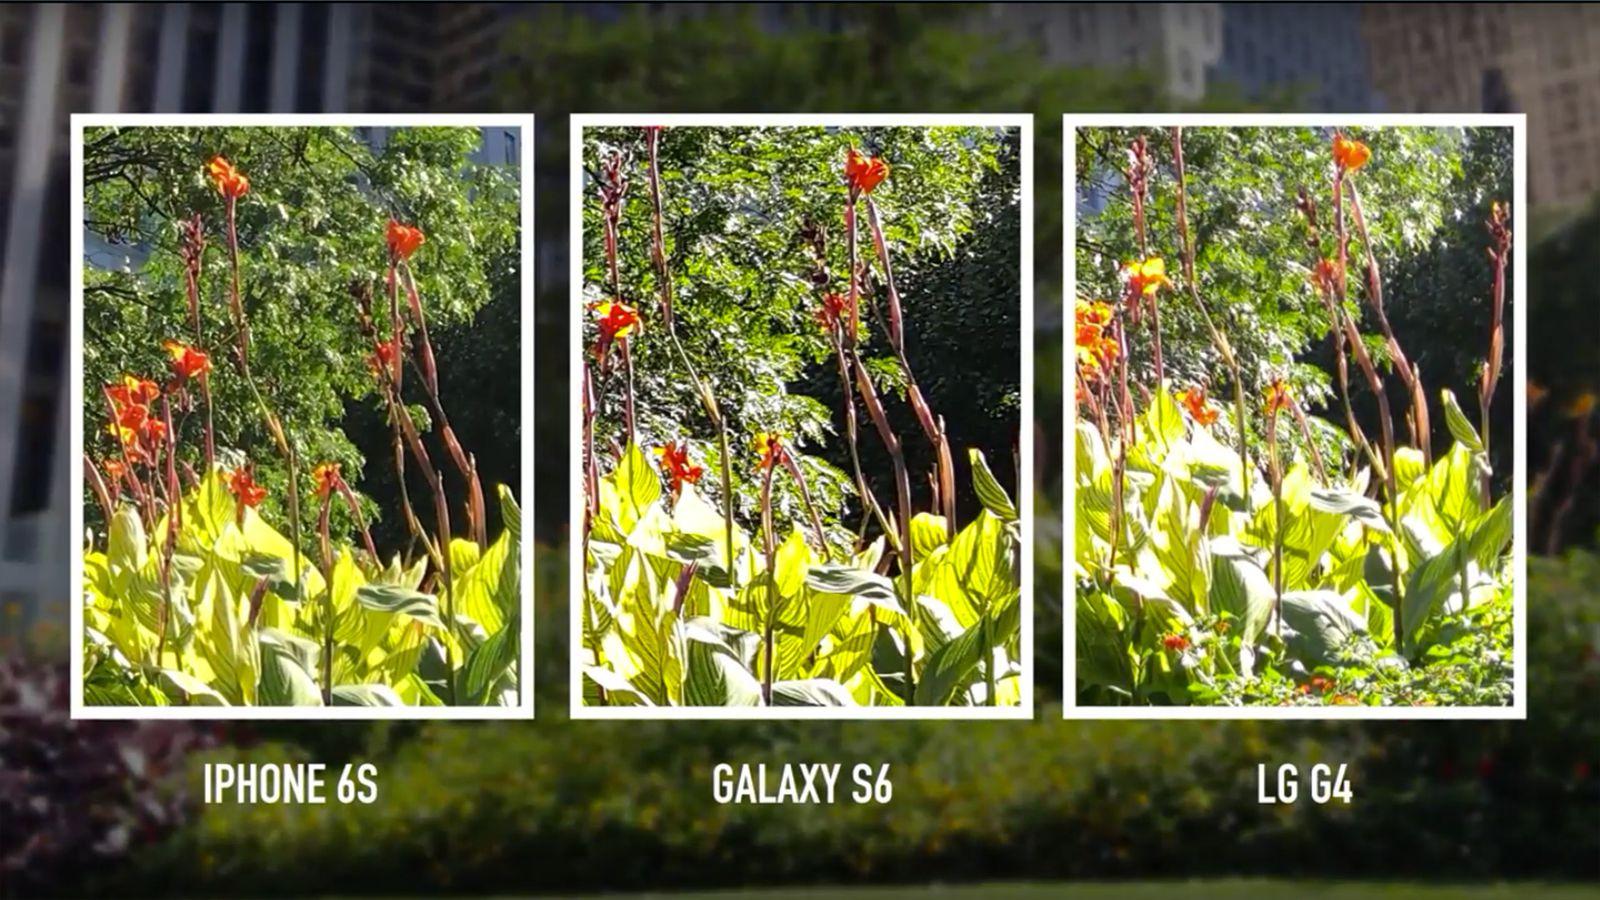 Camera shootout: iPhone 6S vs. Galaxy S6 vs. LG G4